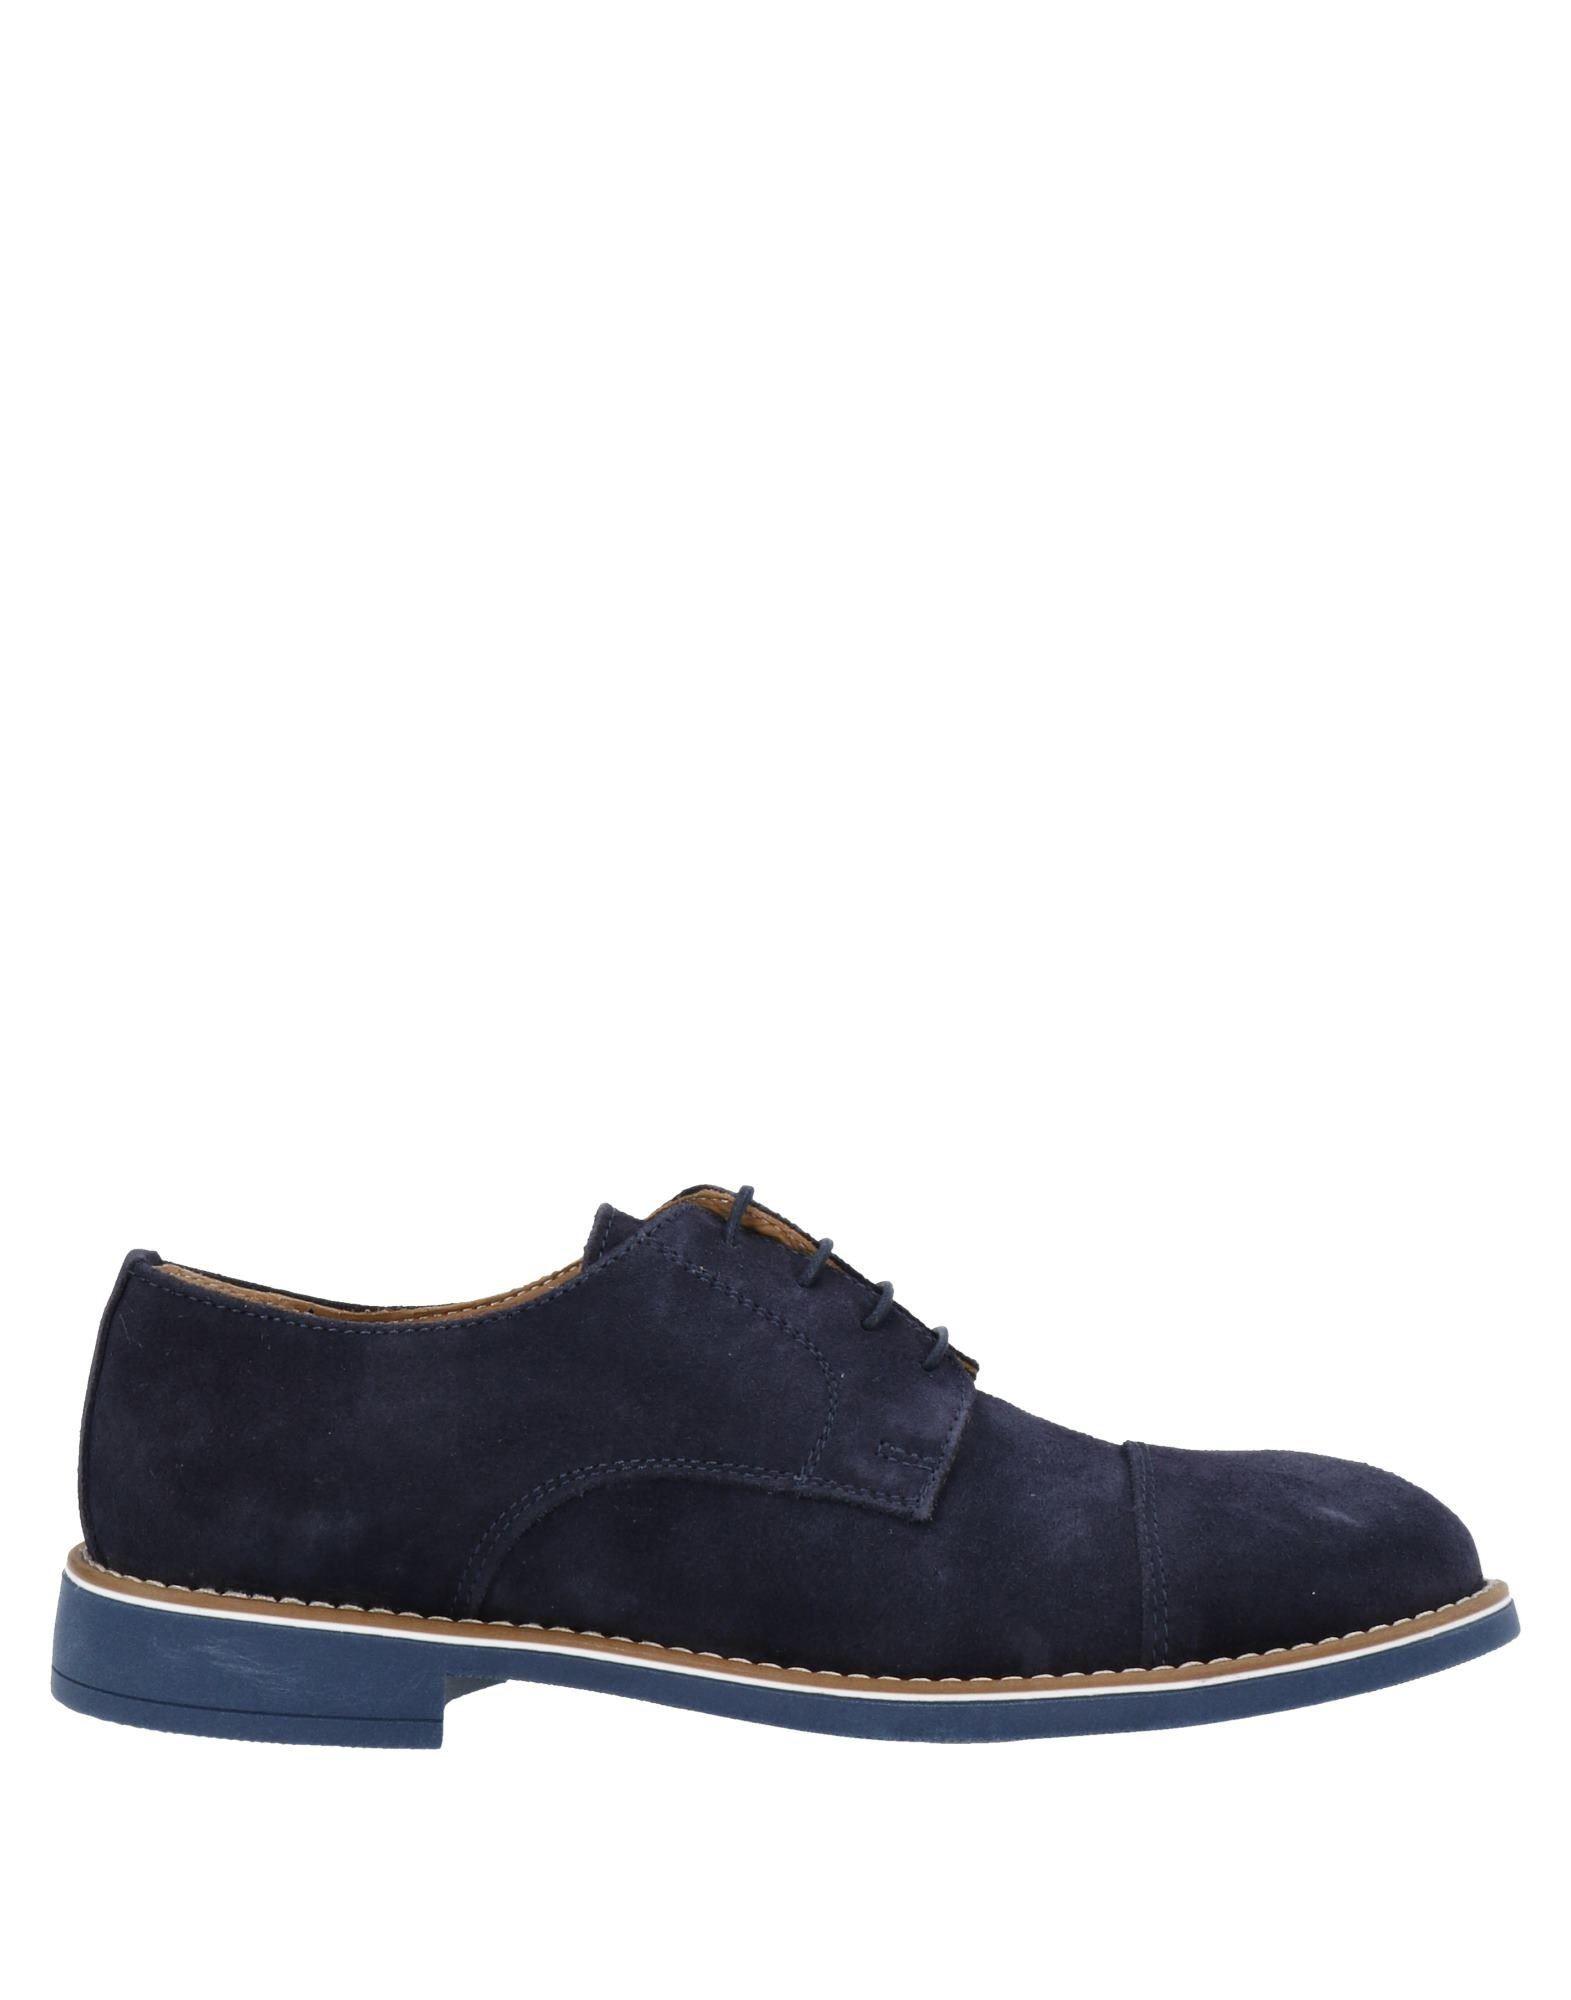 JOHN BAKERY Обувь на шнурках john spencer обувь на шнурках